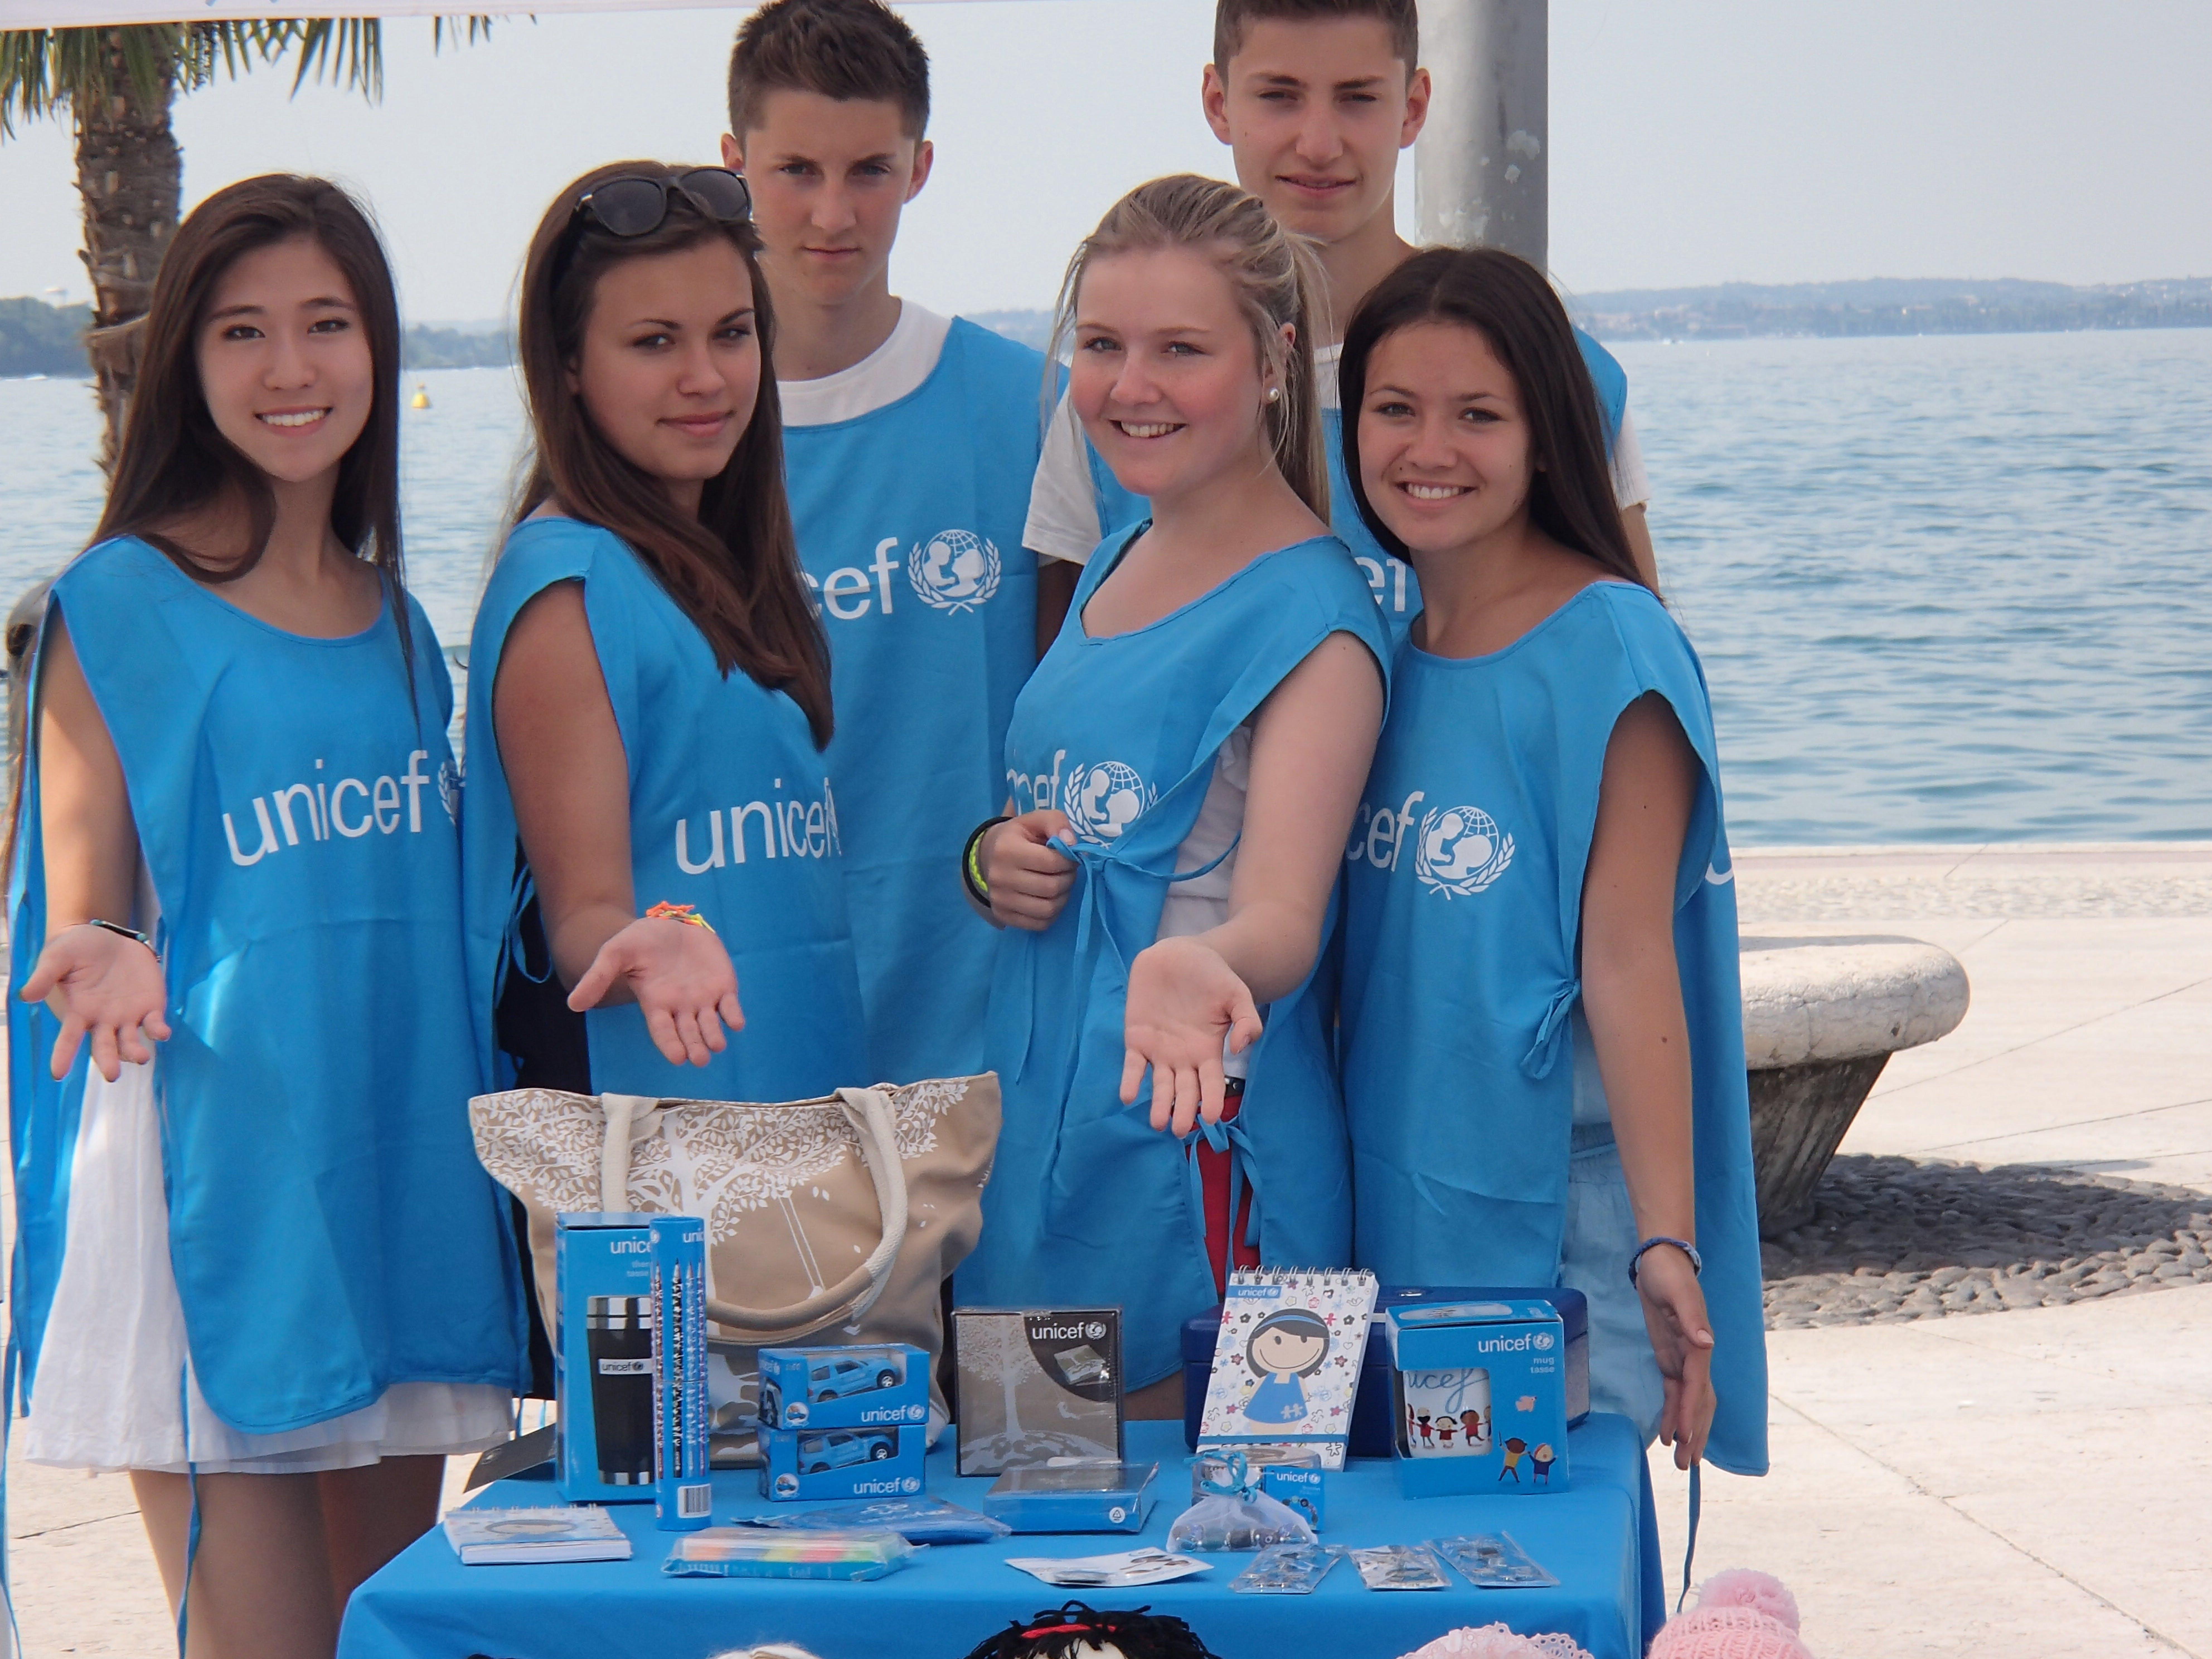 Studenti tedeschi volontari per l'UNICEF a Verona